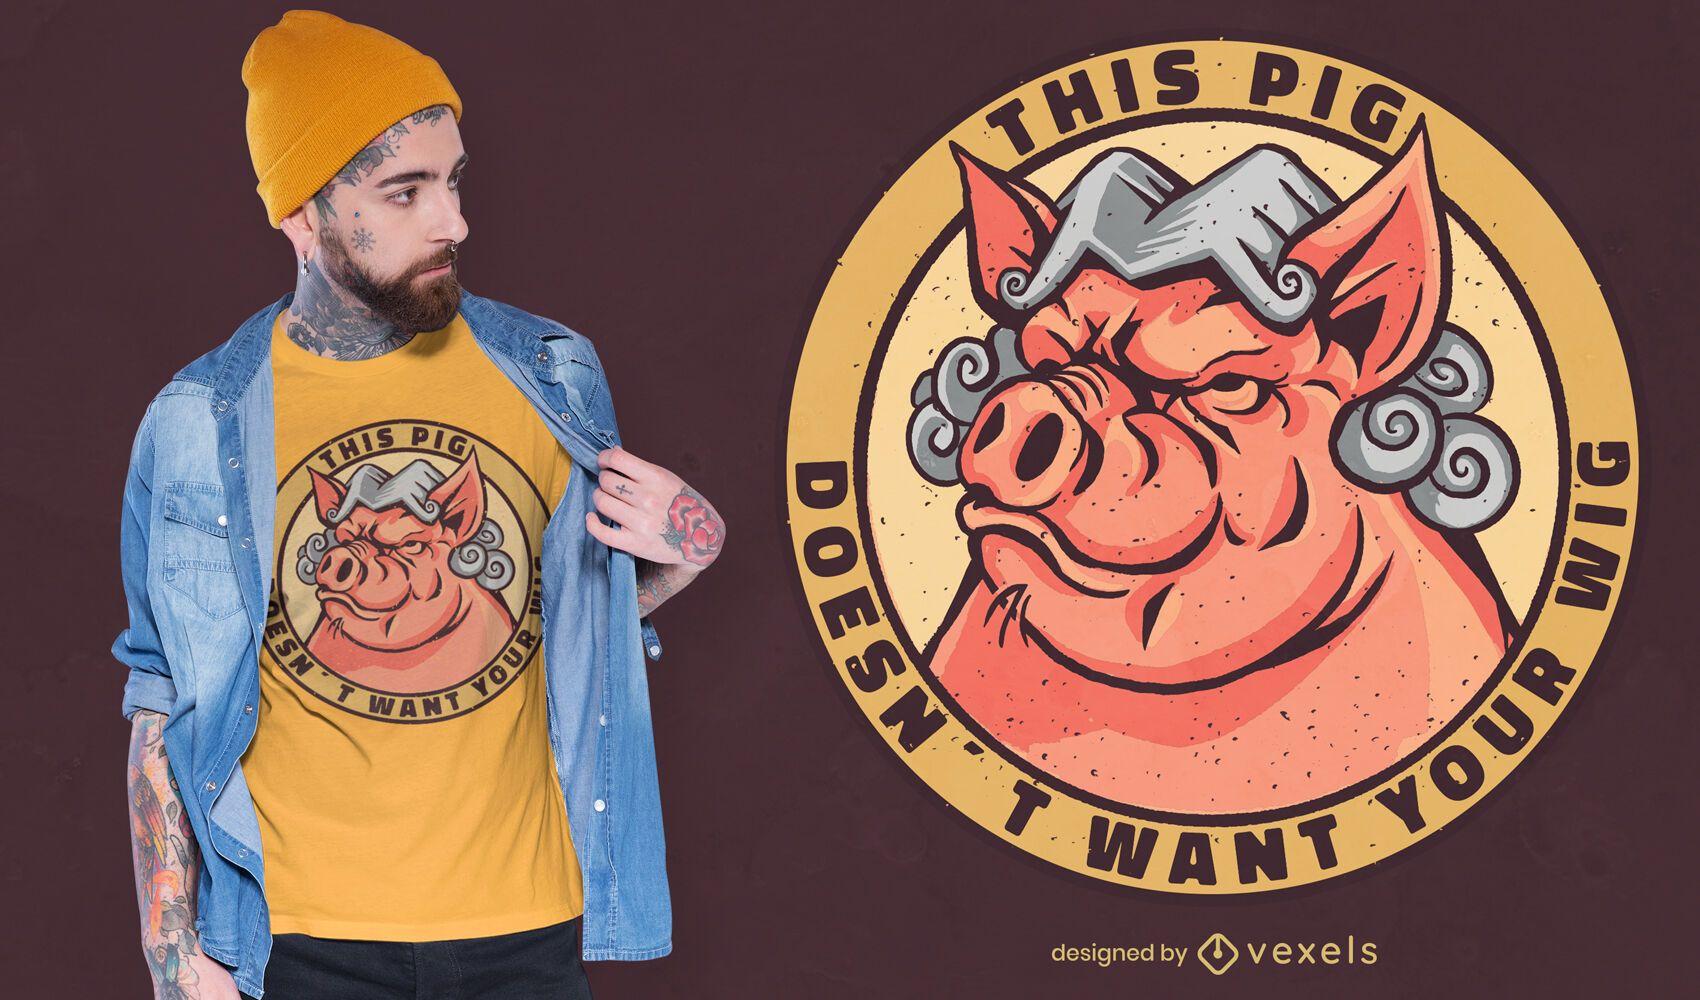 Wig pig t-shirt design